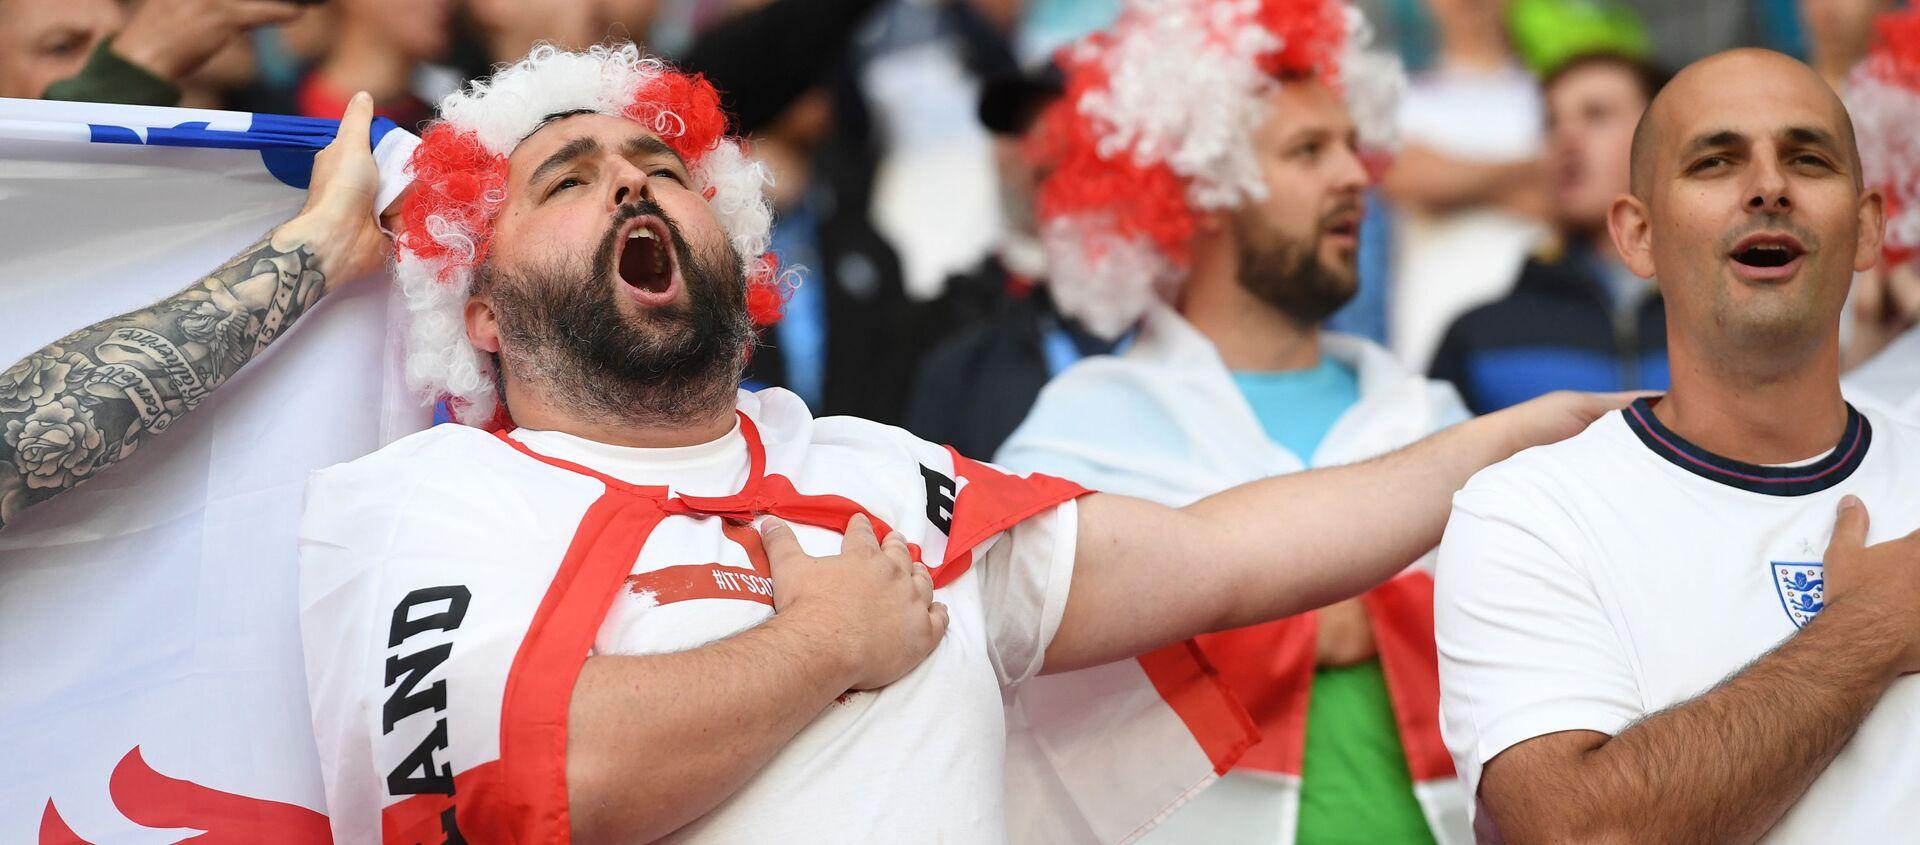 Soccer Football - Euro 2020 - Group D - Czech Republic v England - Wembley Stadium, London, Britain - 22 June 2021 England fans in the stands before the match  - Sputnik International, 1920, 23.06.2021